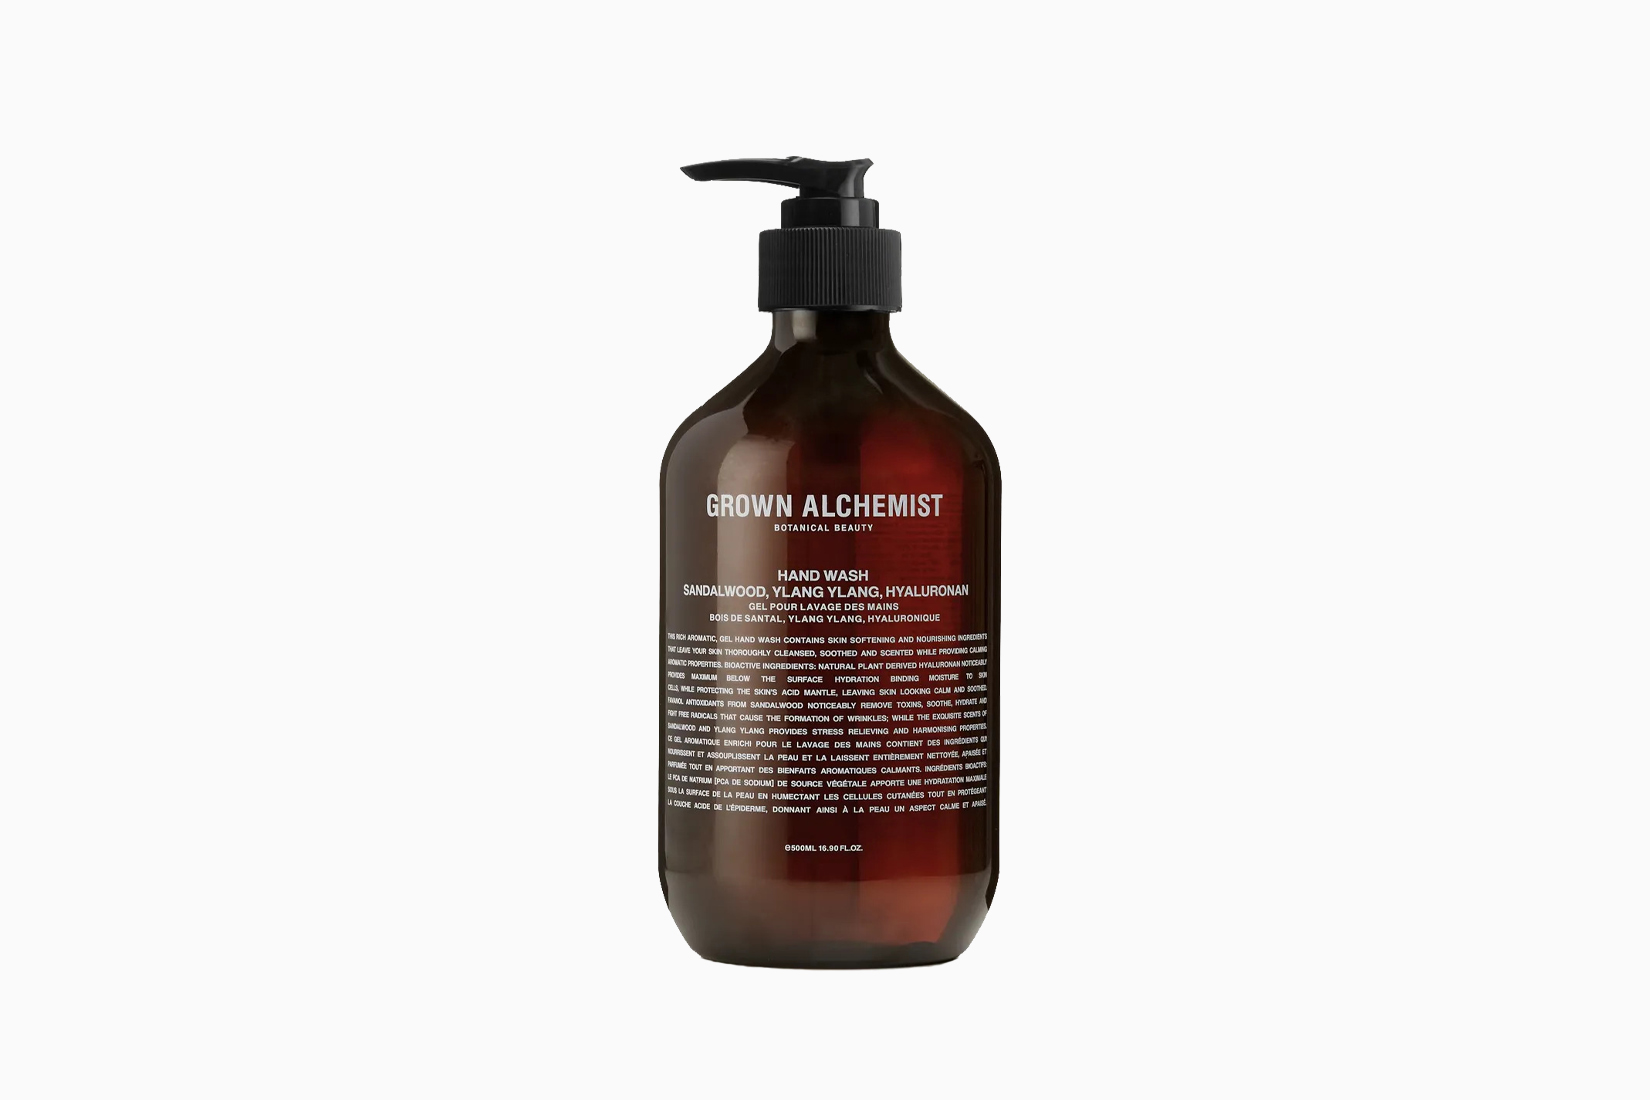 best hand soap grown alchemist review - Luxe Digital